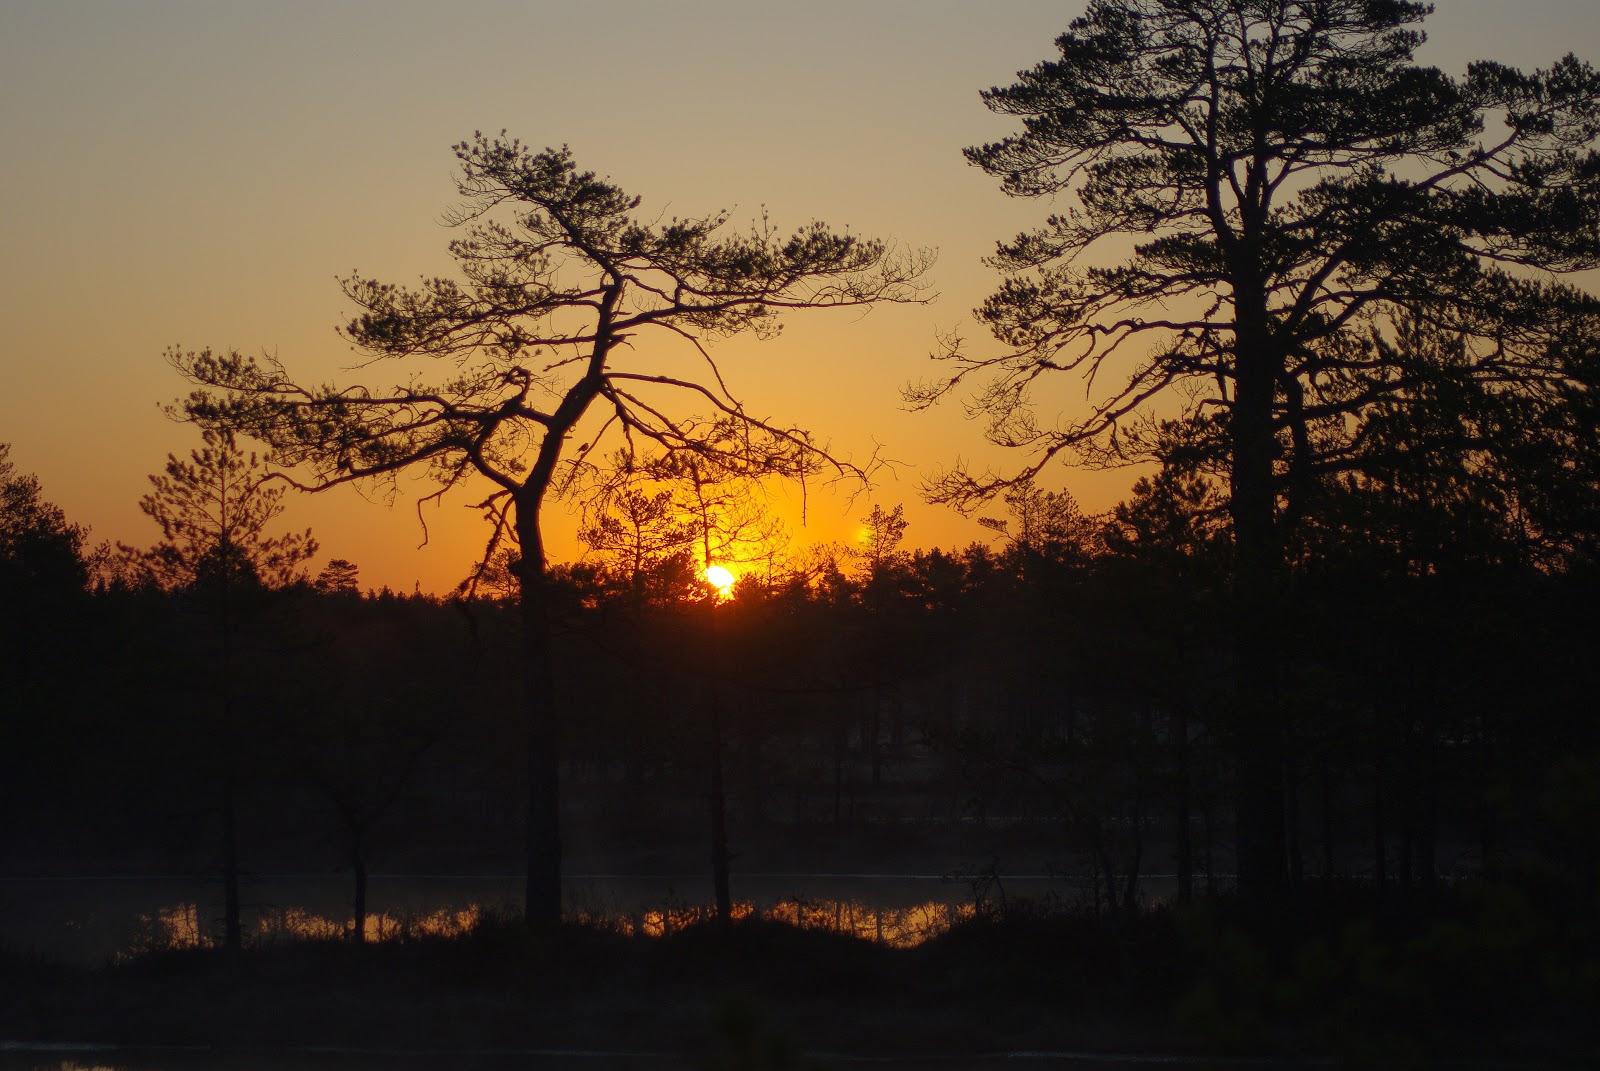 Viru raba õpperada päikesetõus Kalev Vask